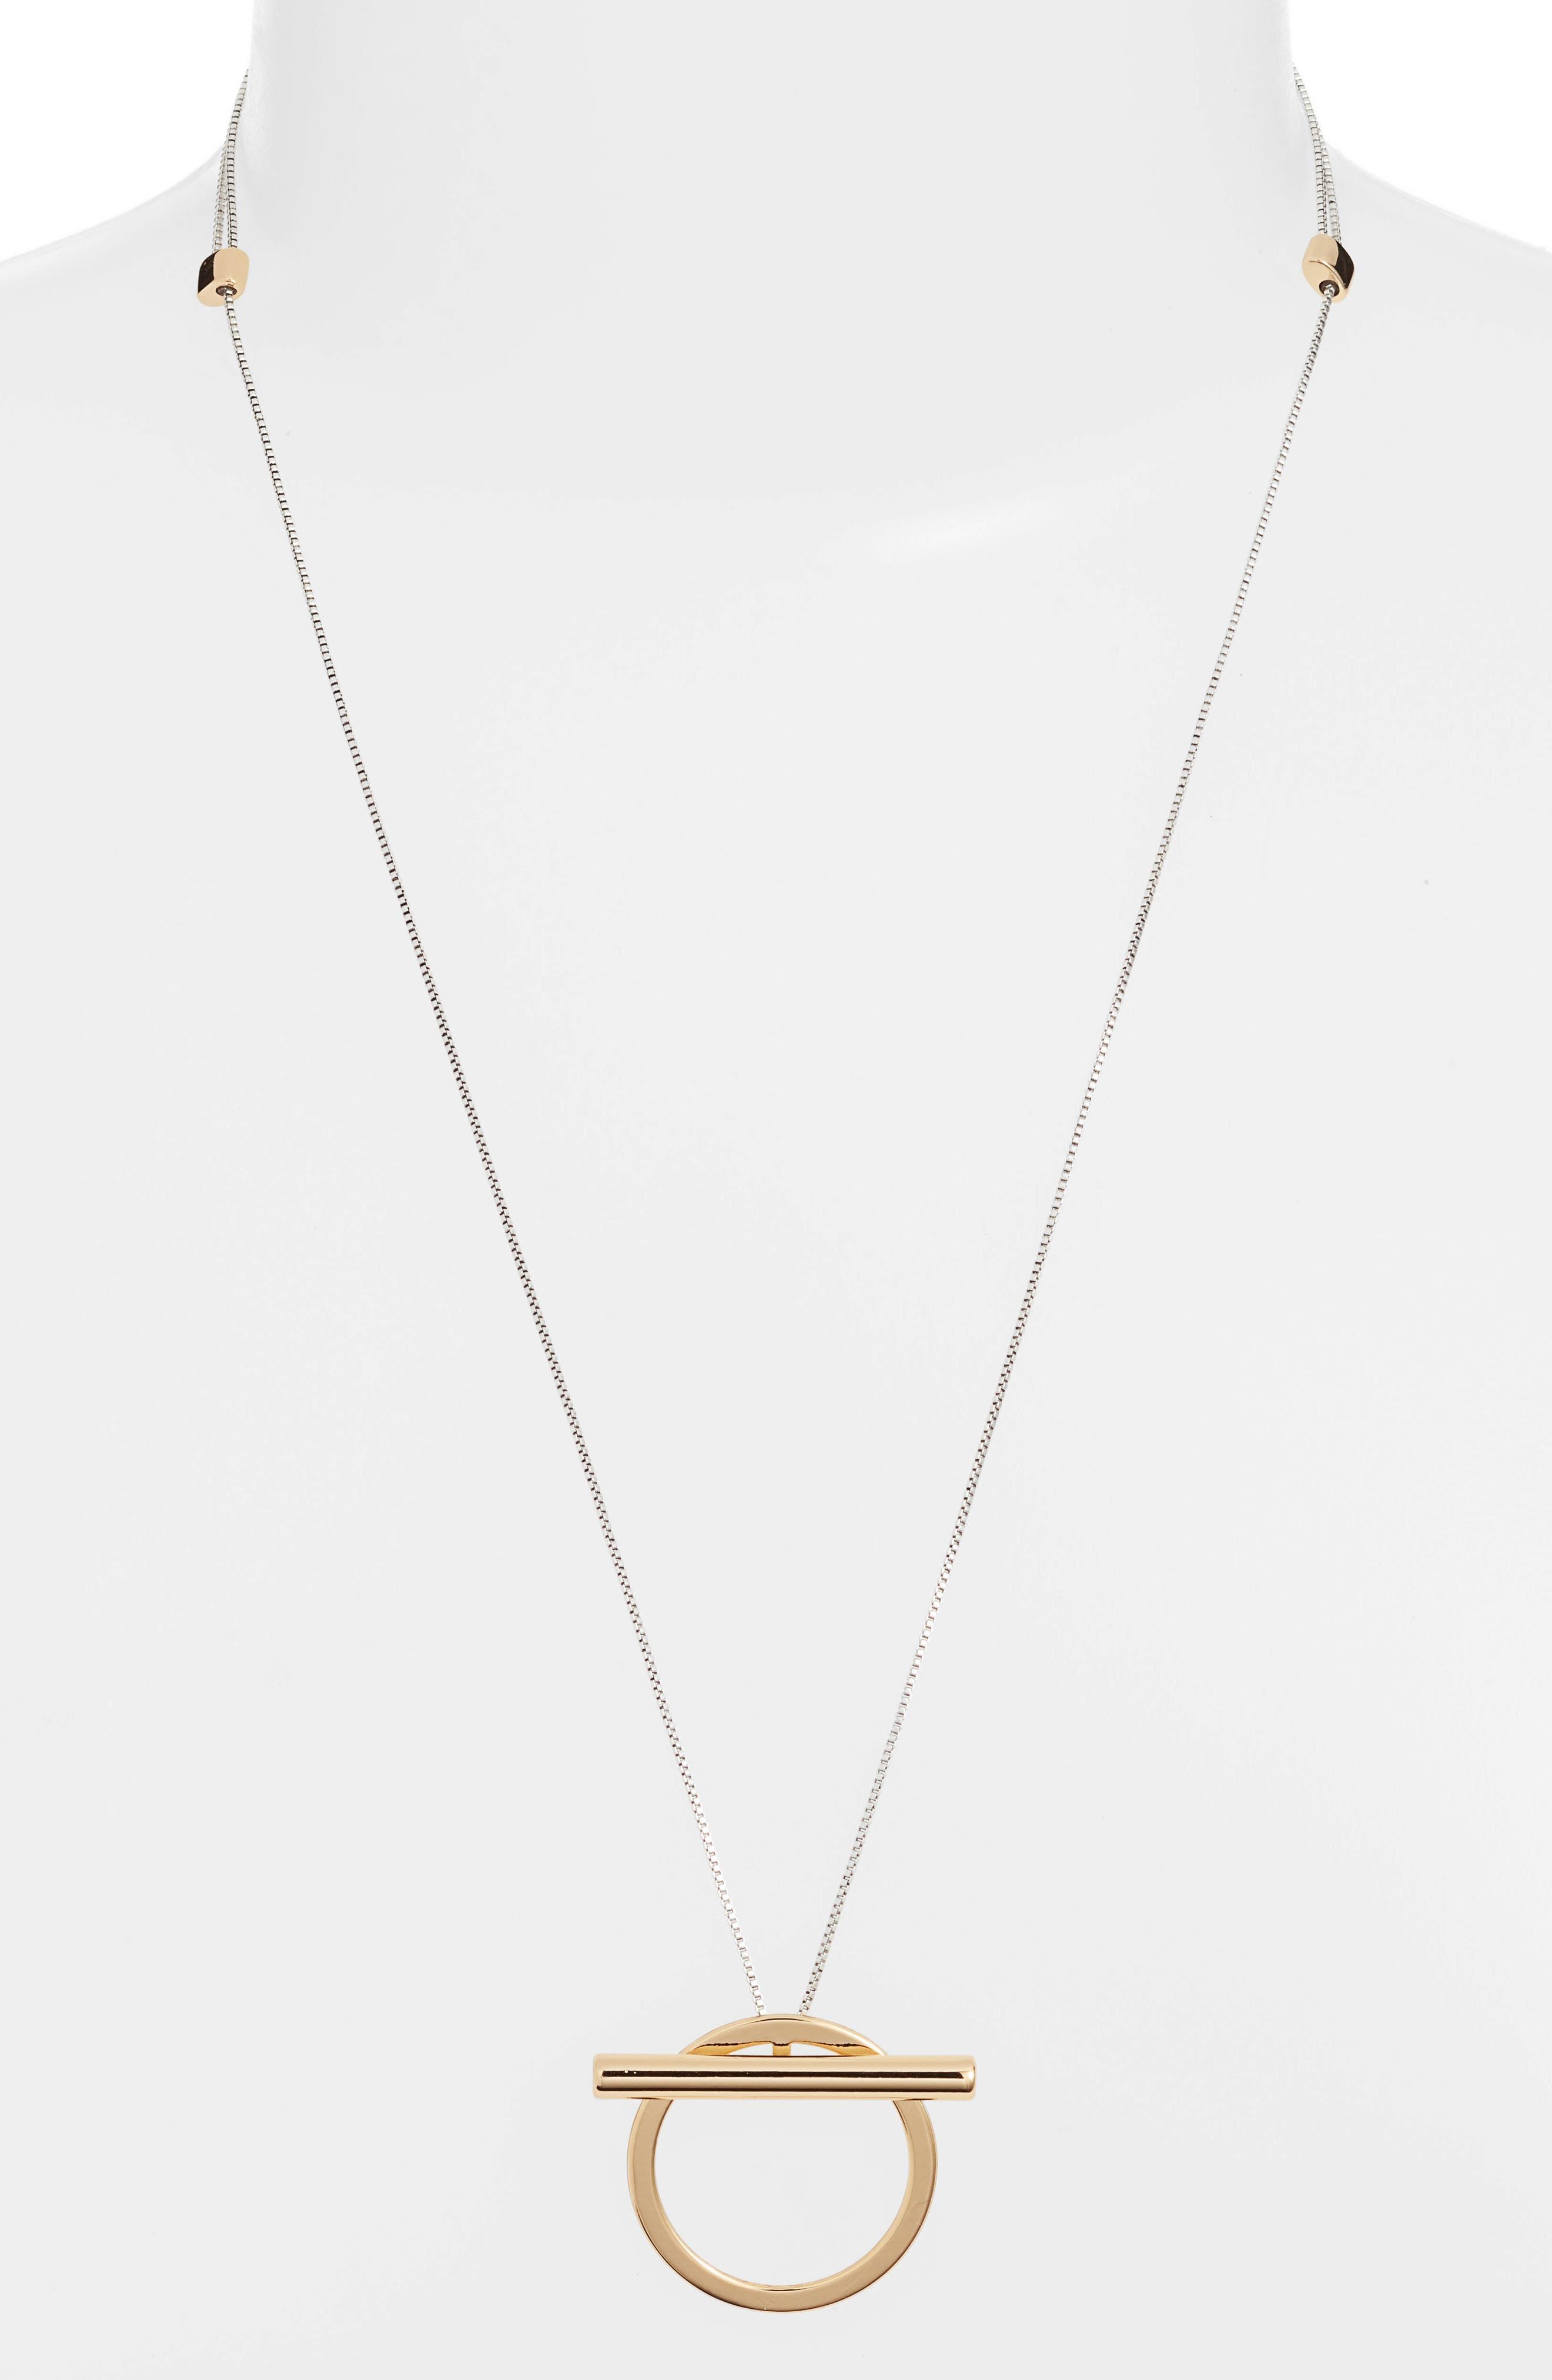 JENNY BIRD Trust Pendant Necklace in Two-Tone